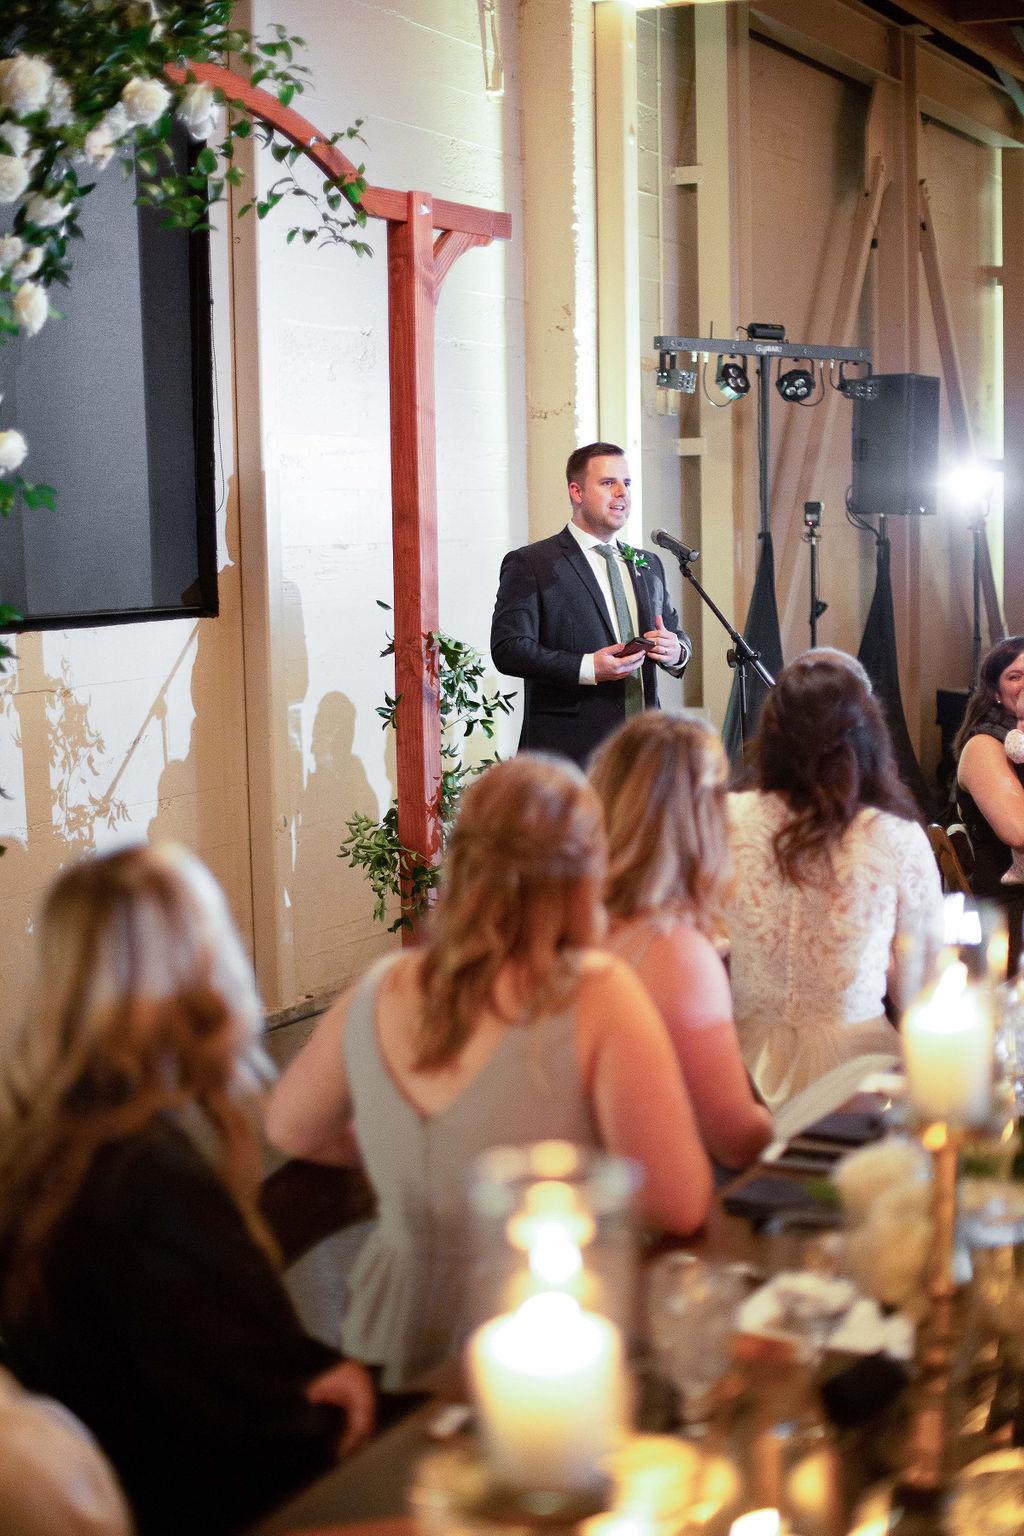 026_reception_portland,oregon,castaway,wedding,by_outlive_creative,photo,and,video.jpg